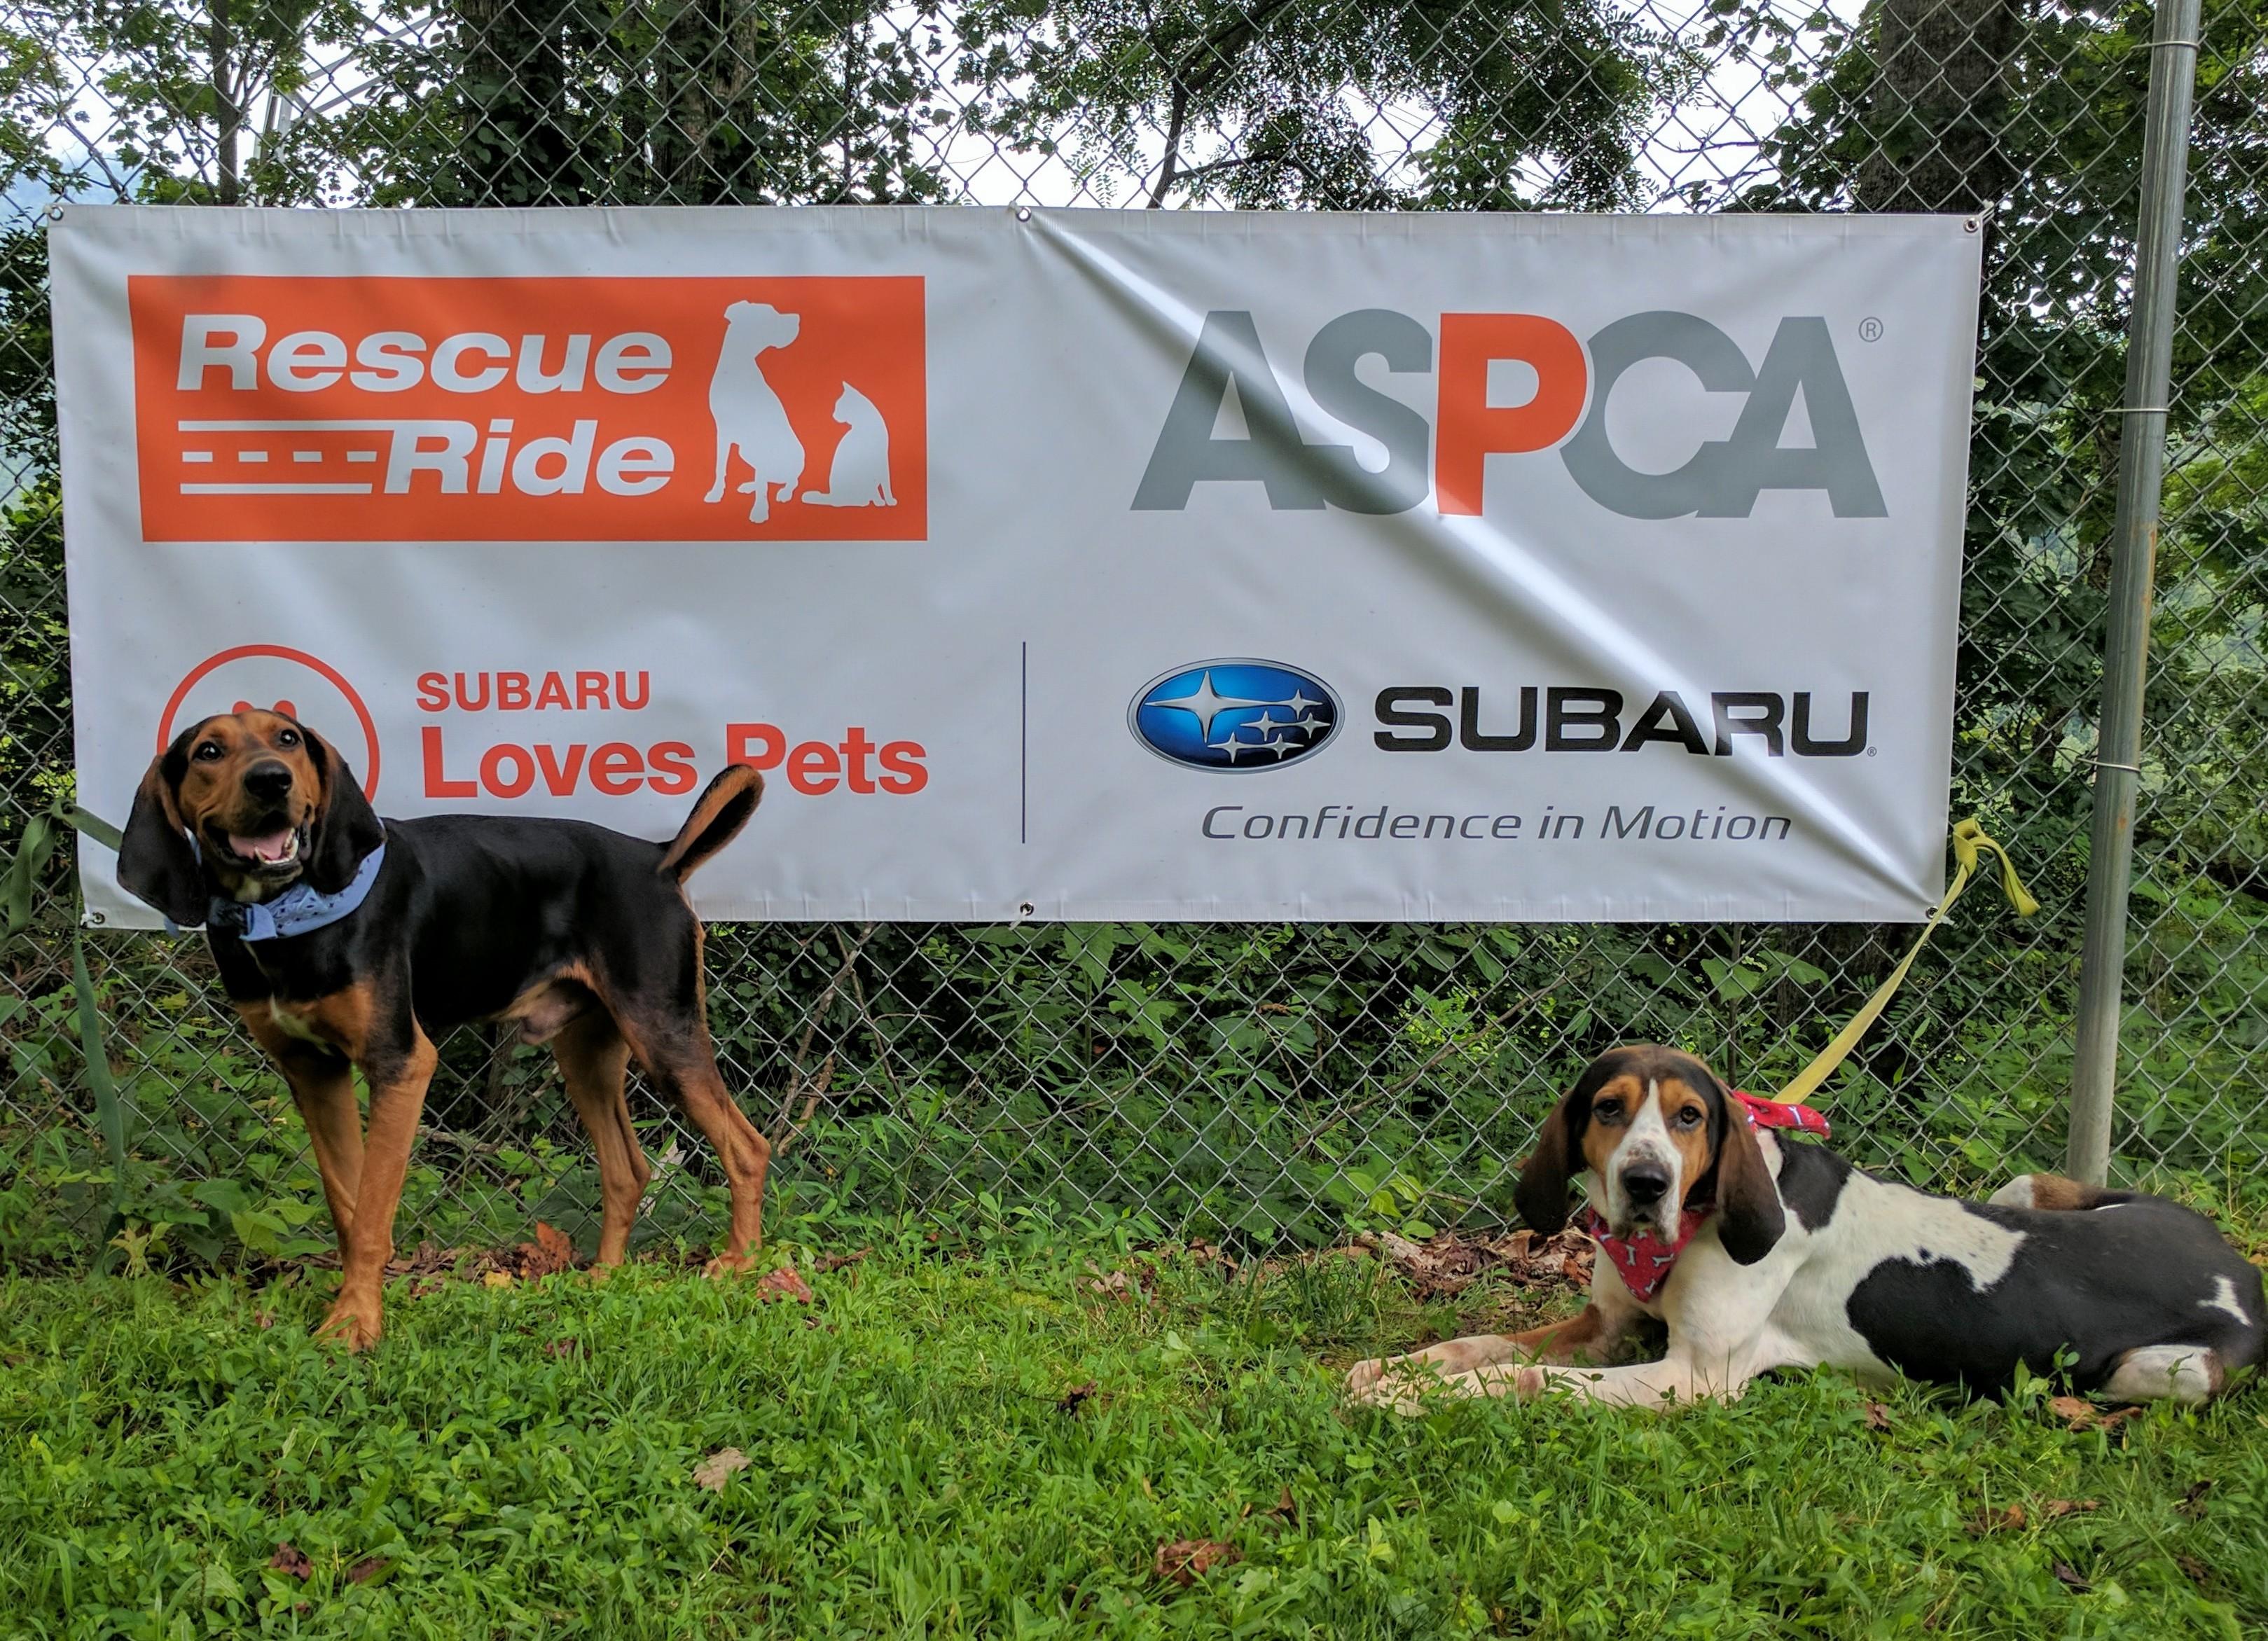 Thanks to ASPCA/Subaru Rescue Ride